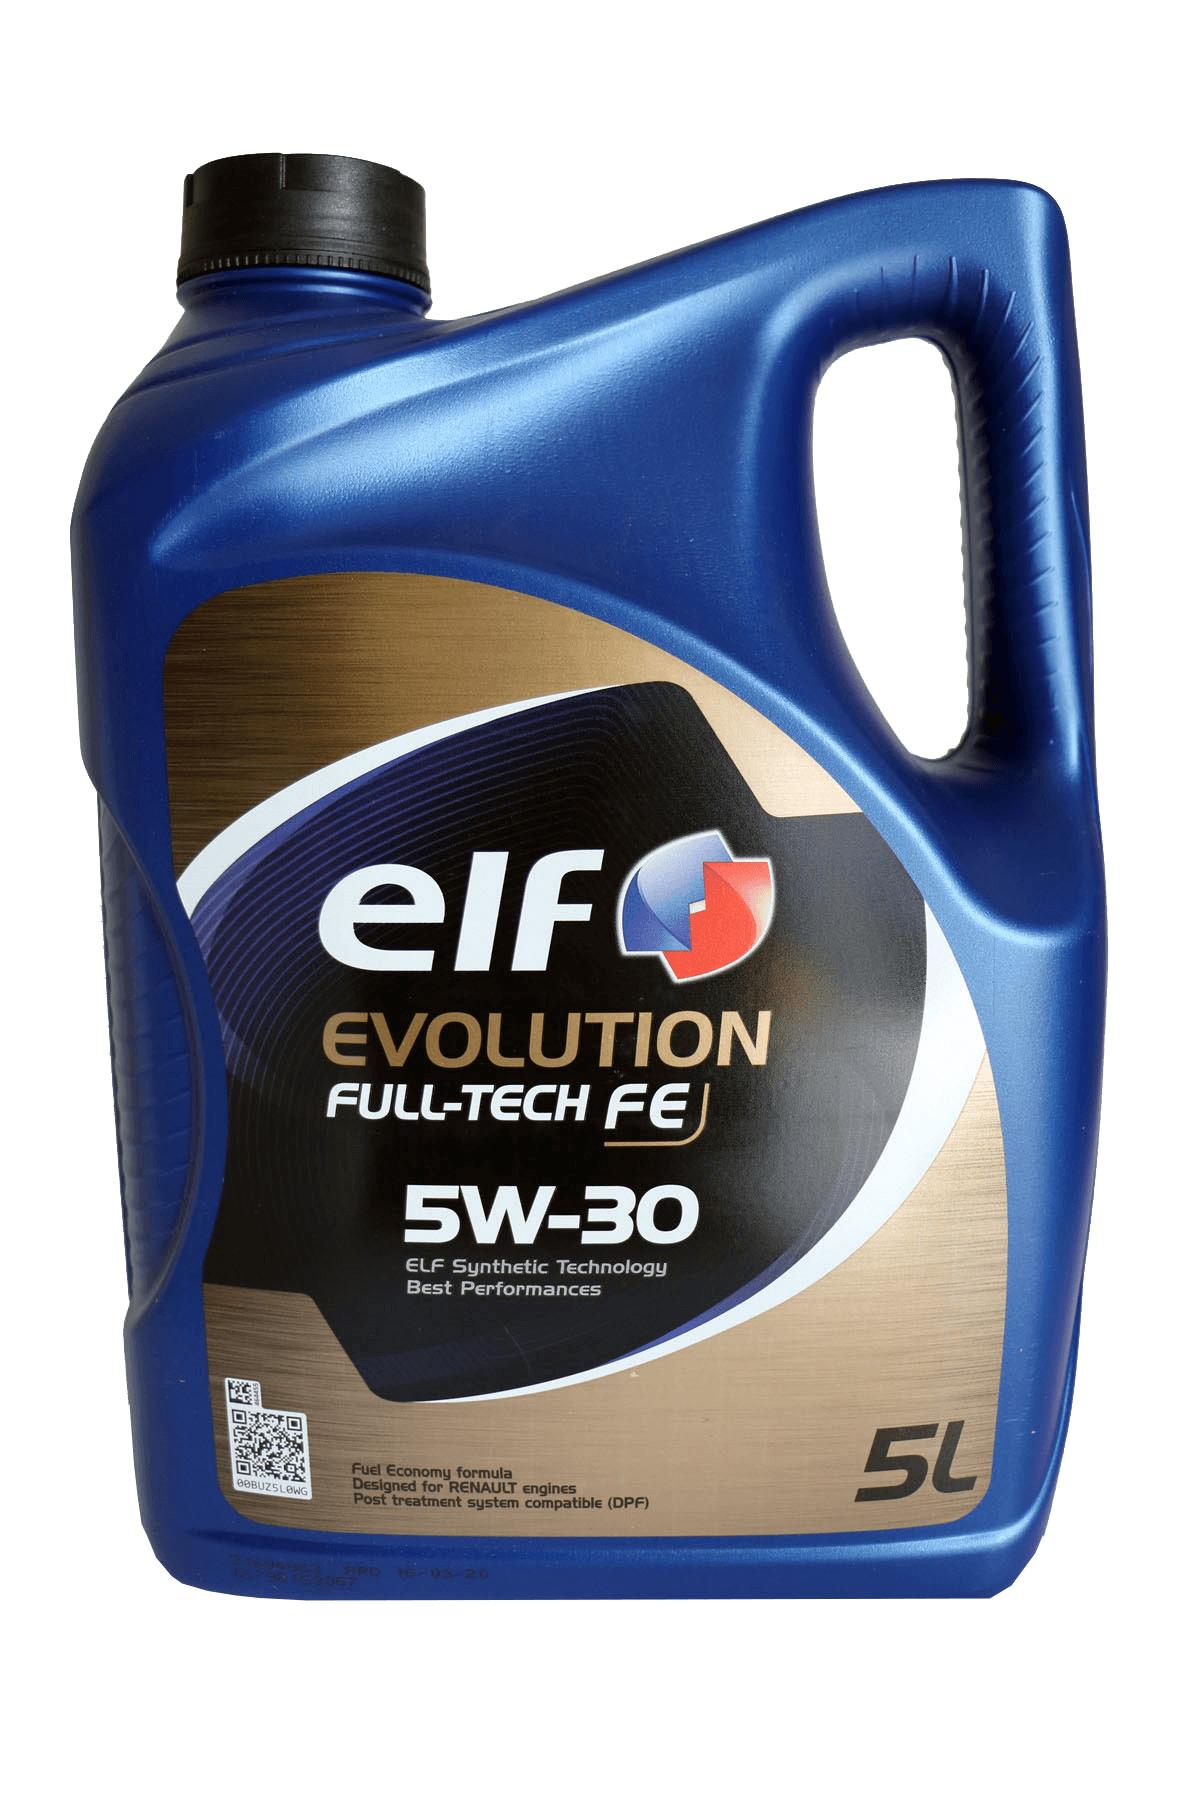 ELF Evolution Full-Tech FE 5W-30 Motoröl, 5l